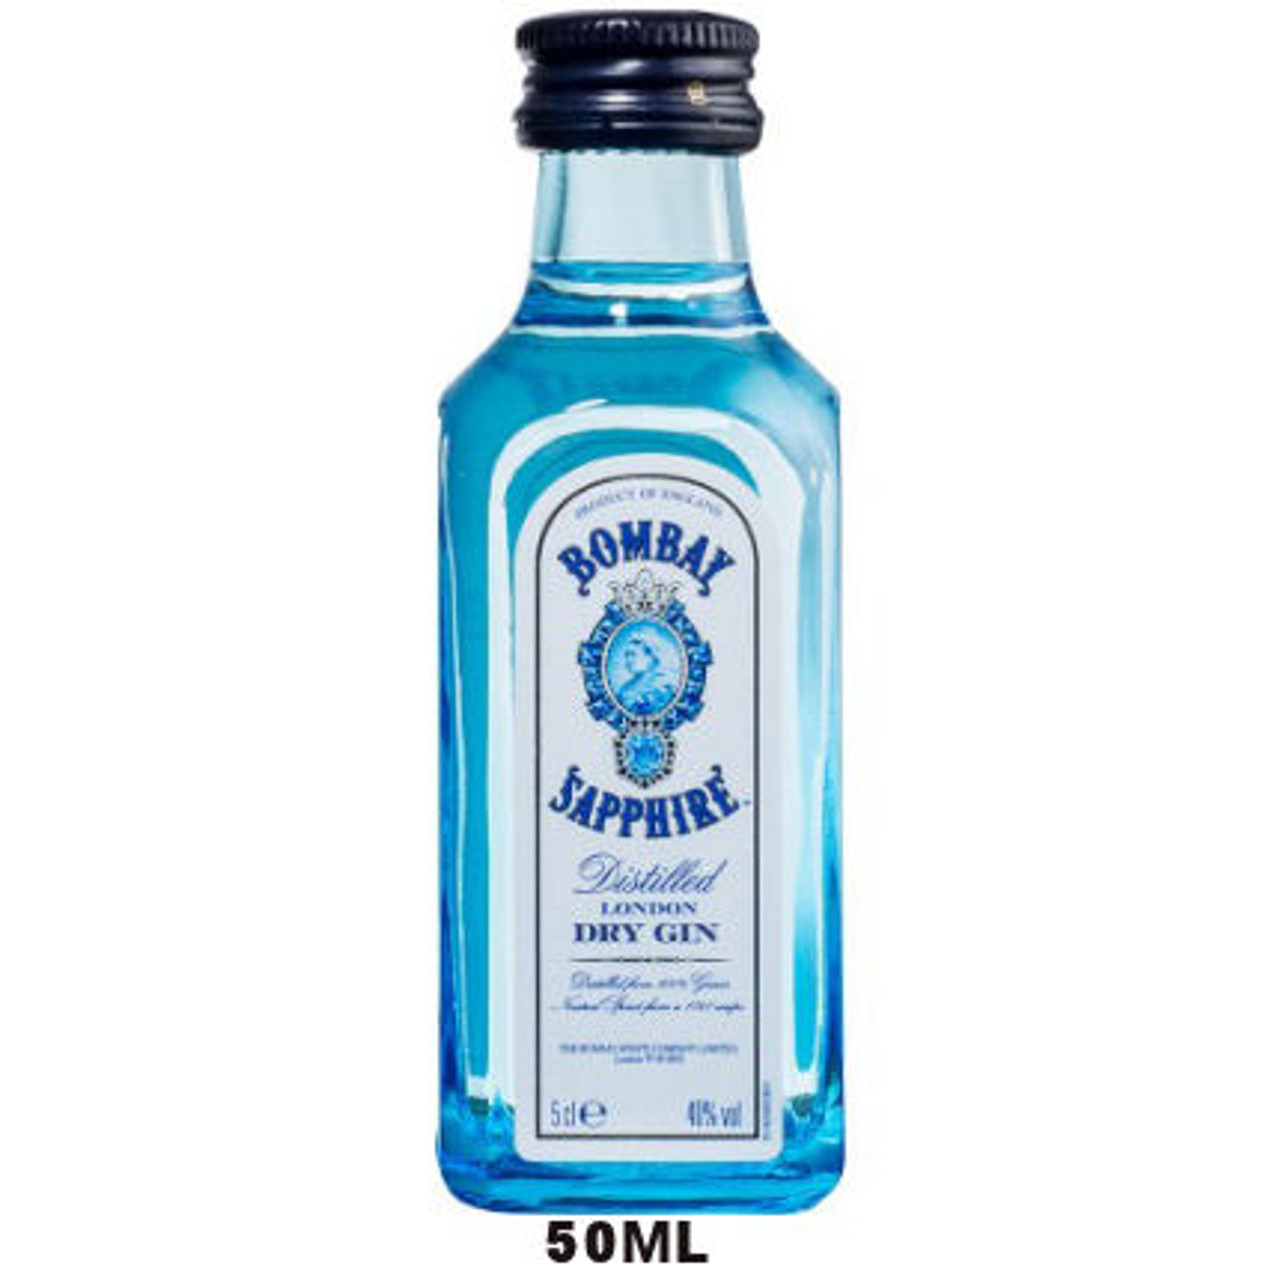 50ml Mini Bombay Sapphire London Dry Gin